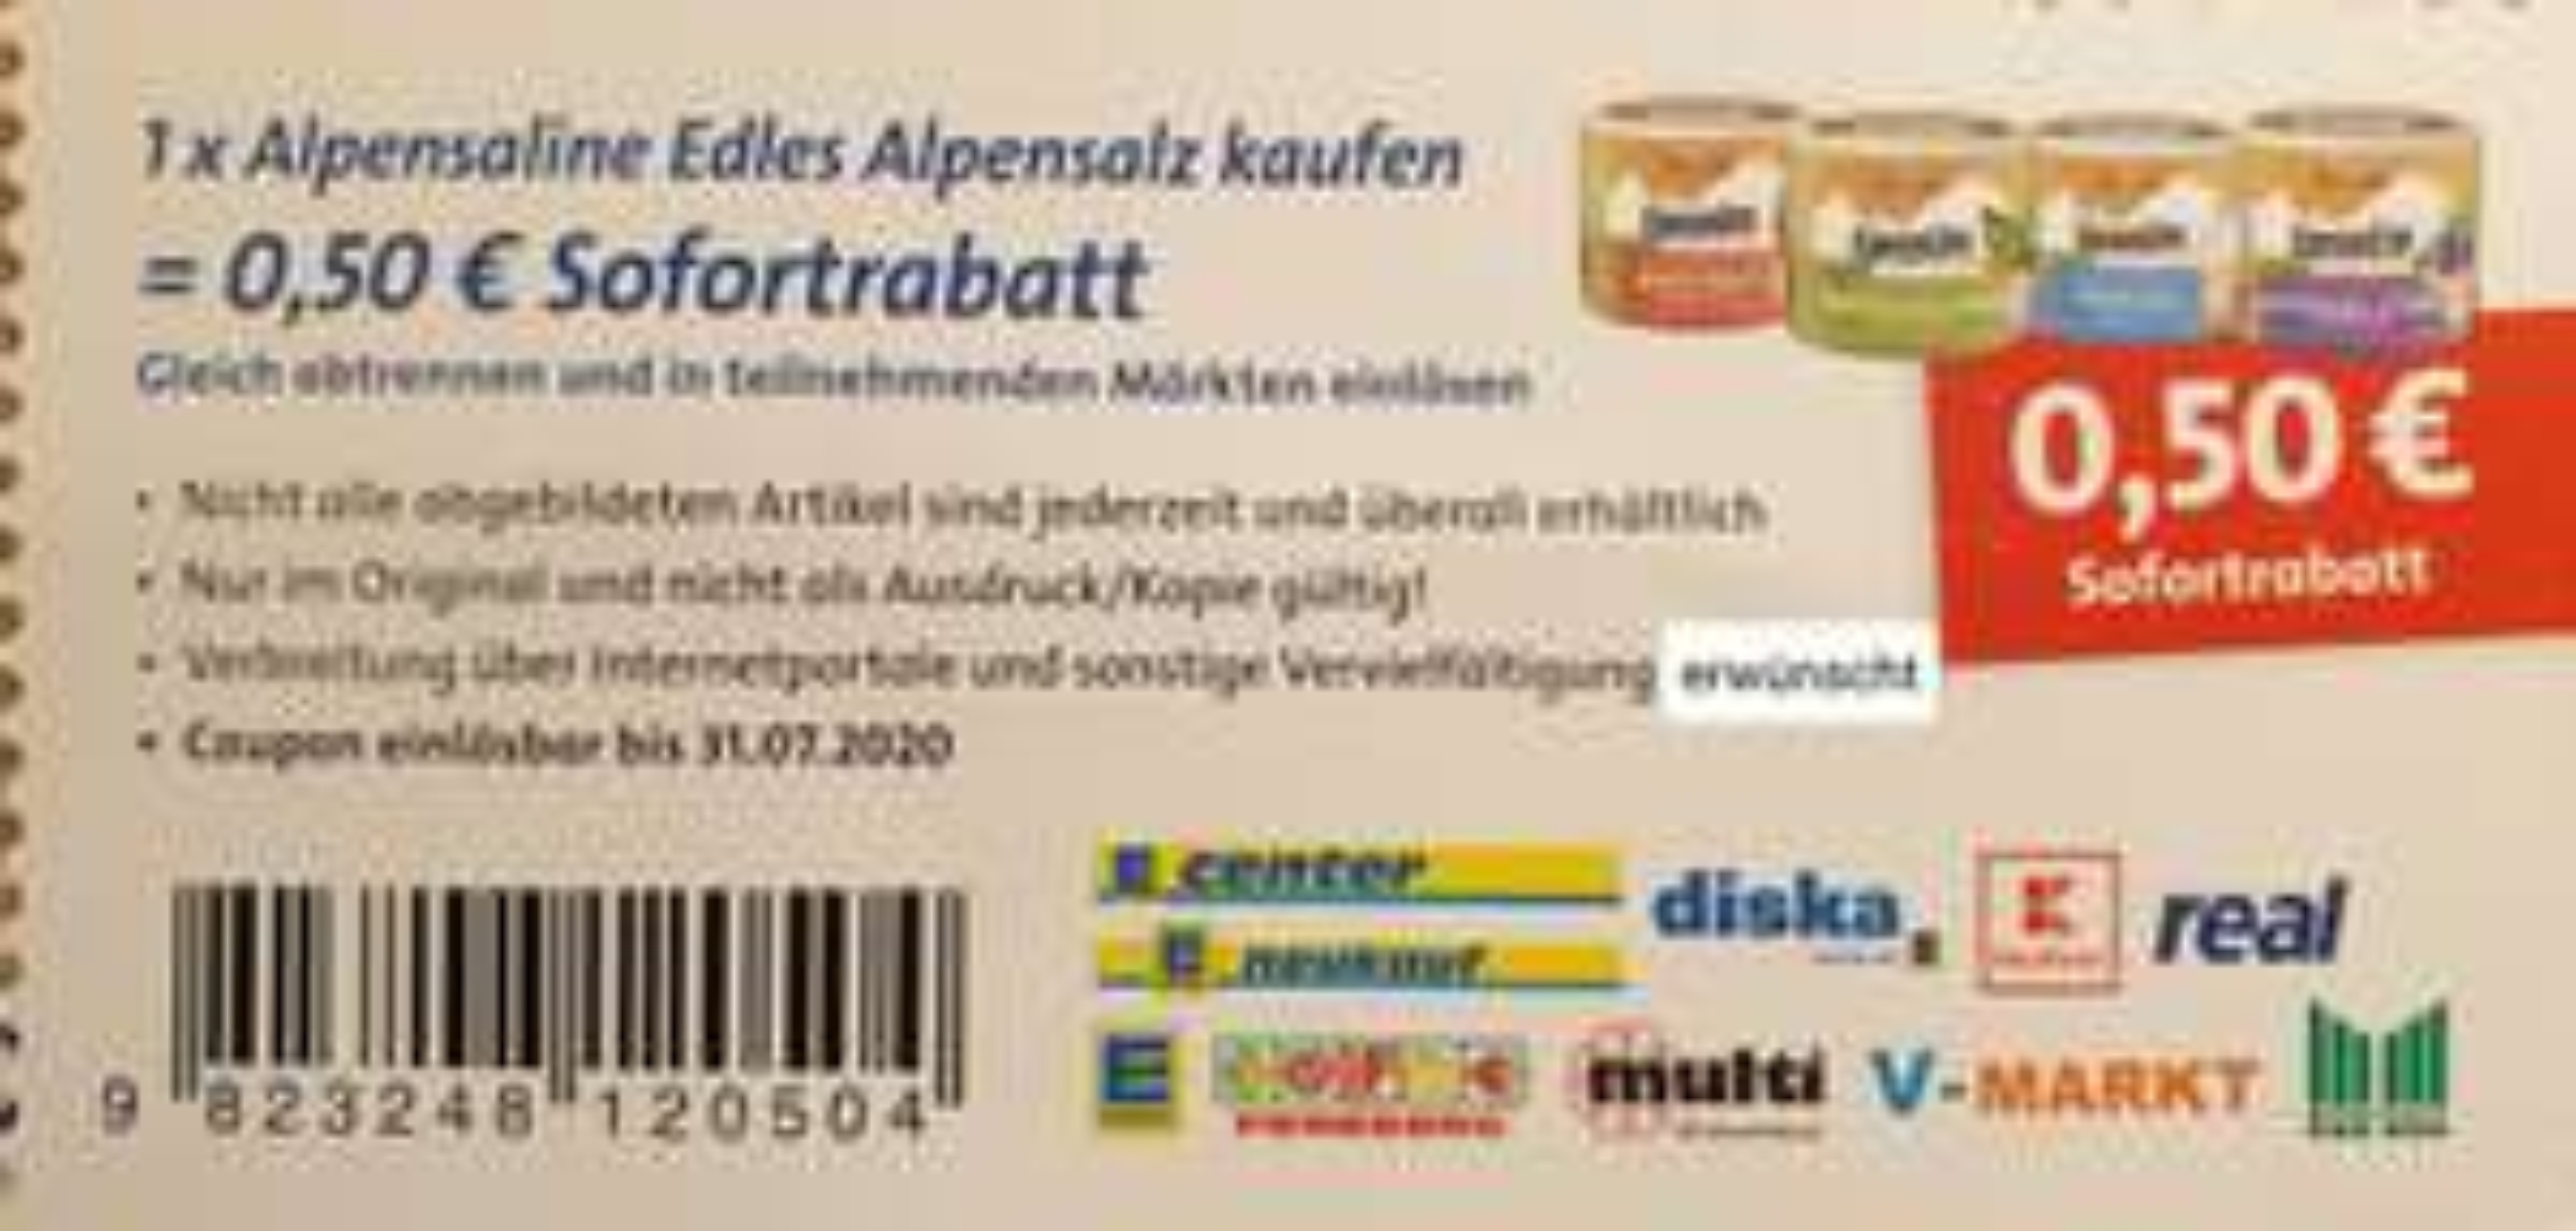 "[- 0,50 €] Coupon für ""Alpensaline Edles Alpensalz"" (u. a. Edeka, Kaufland, real)"